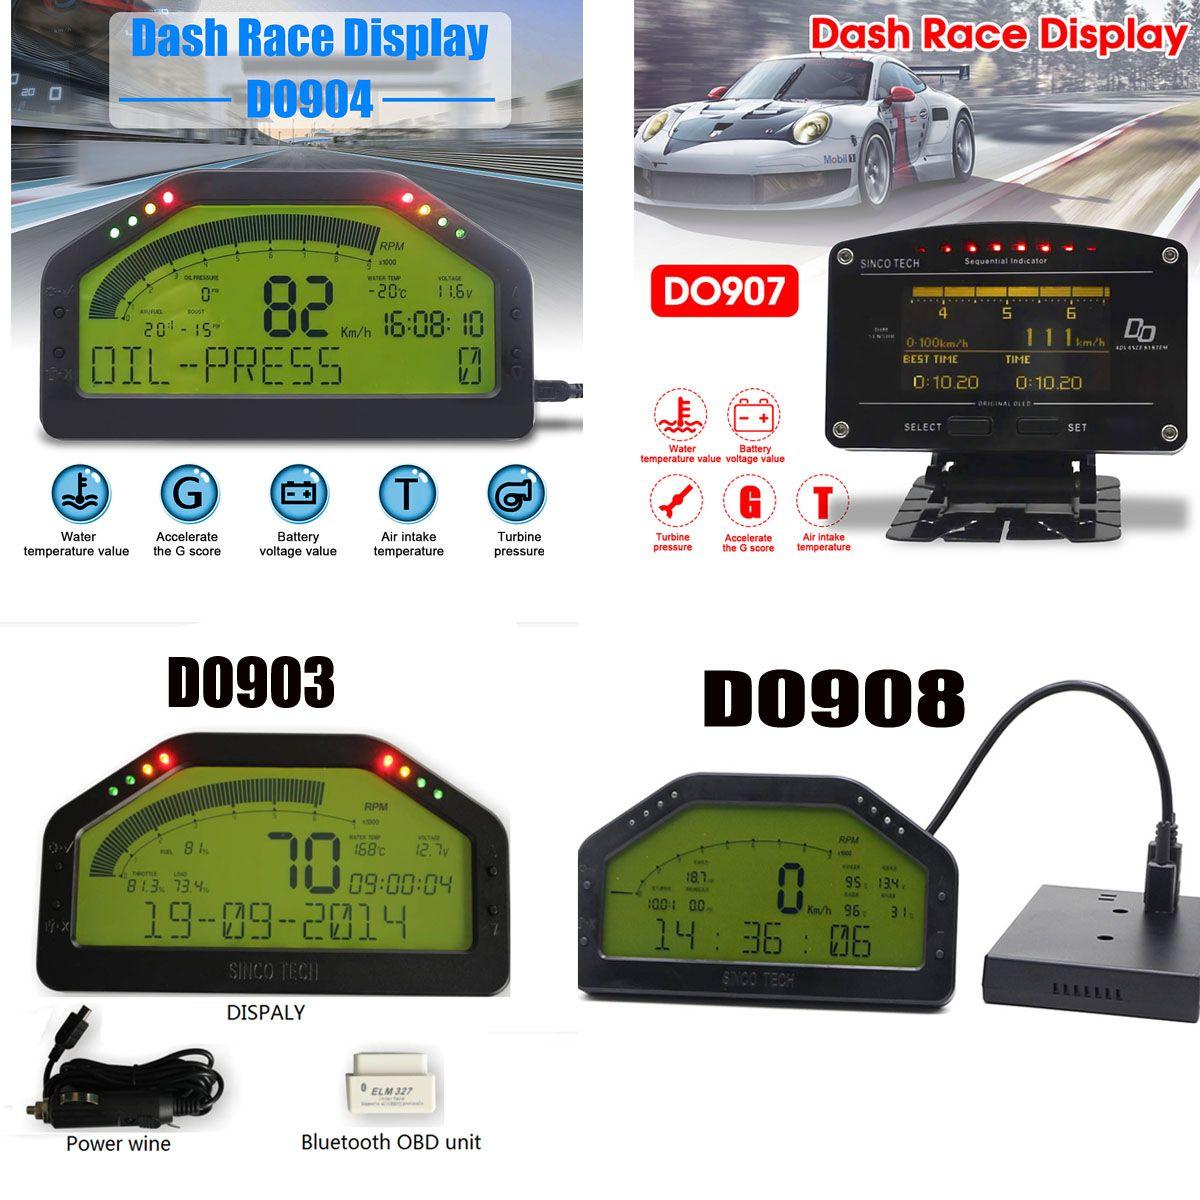 Waterproof Dash Race Display Full Sensor Kit LCD Screen OBD Bluetooh Connection Universal DashBoard DO903 DO904 DO907 DO908